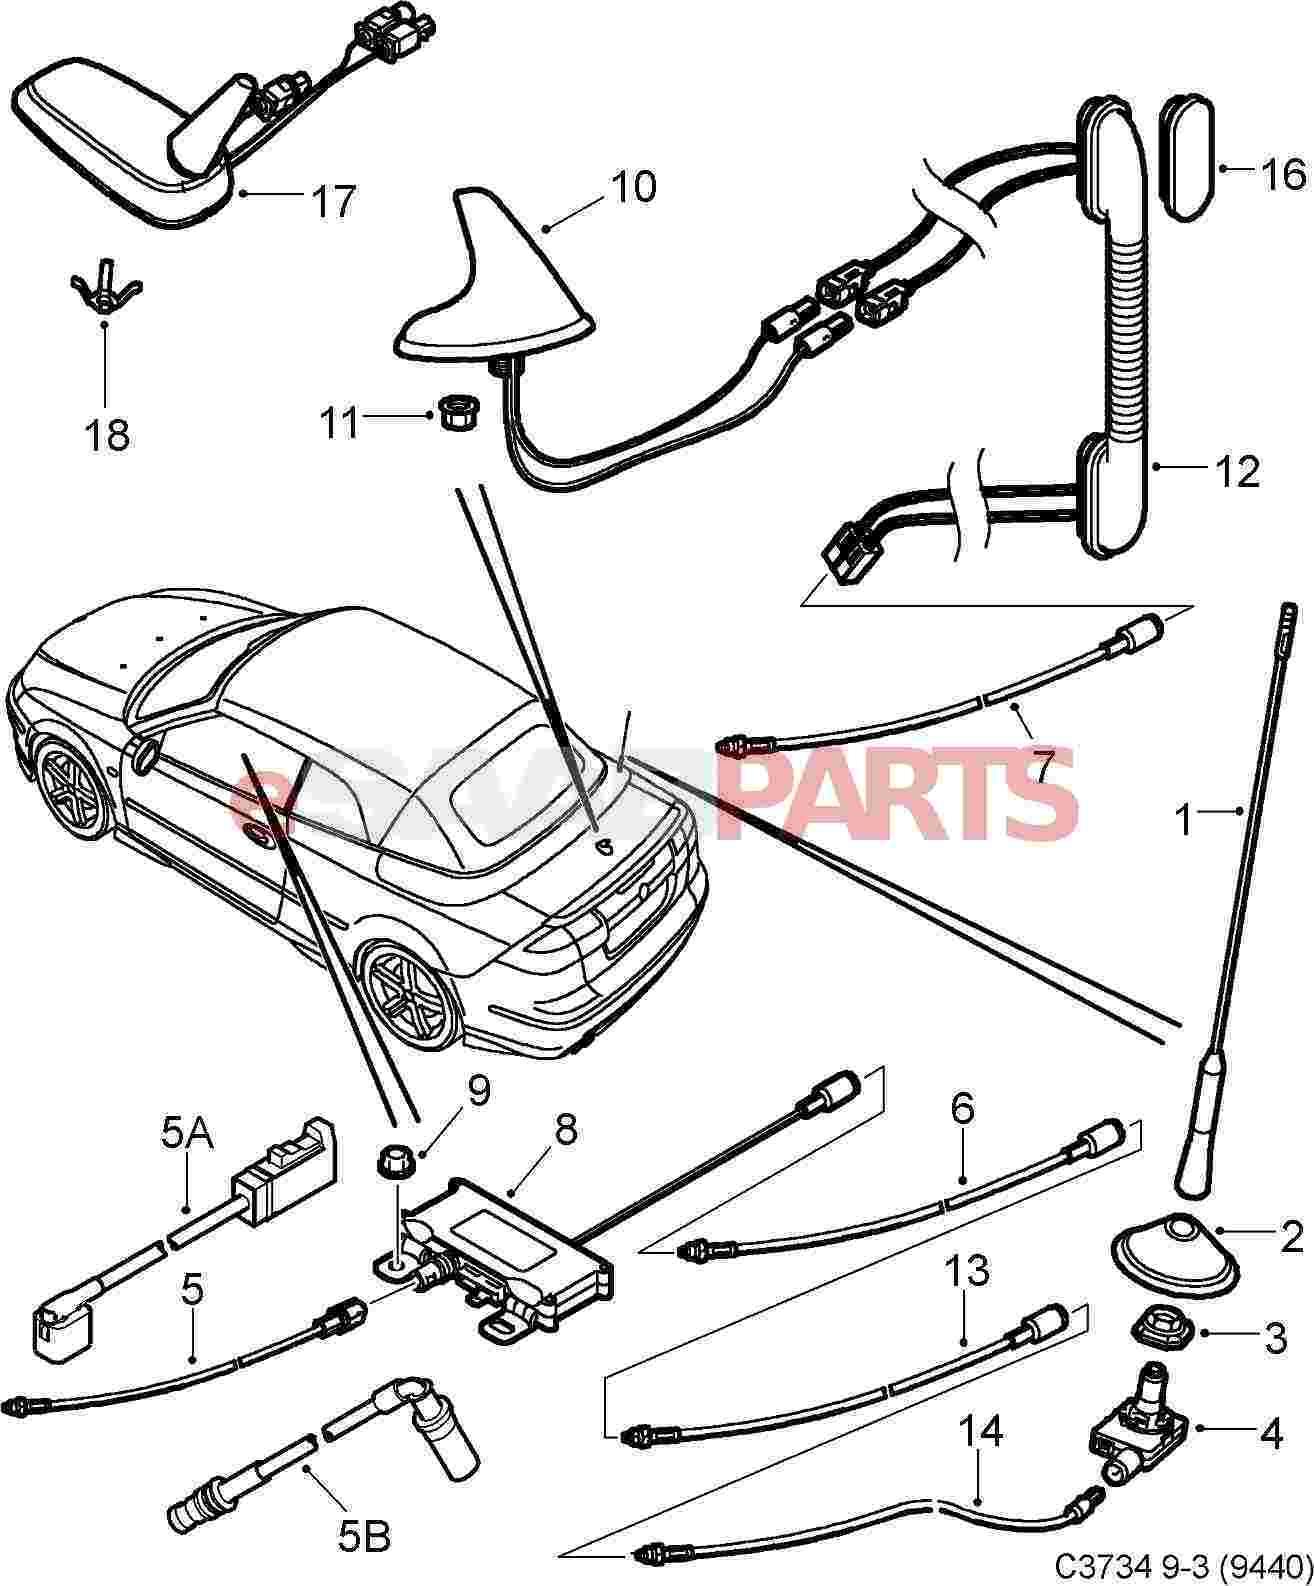 Subaru Svx Fuse Box Diagram Subaru Auto Wiring Diagram